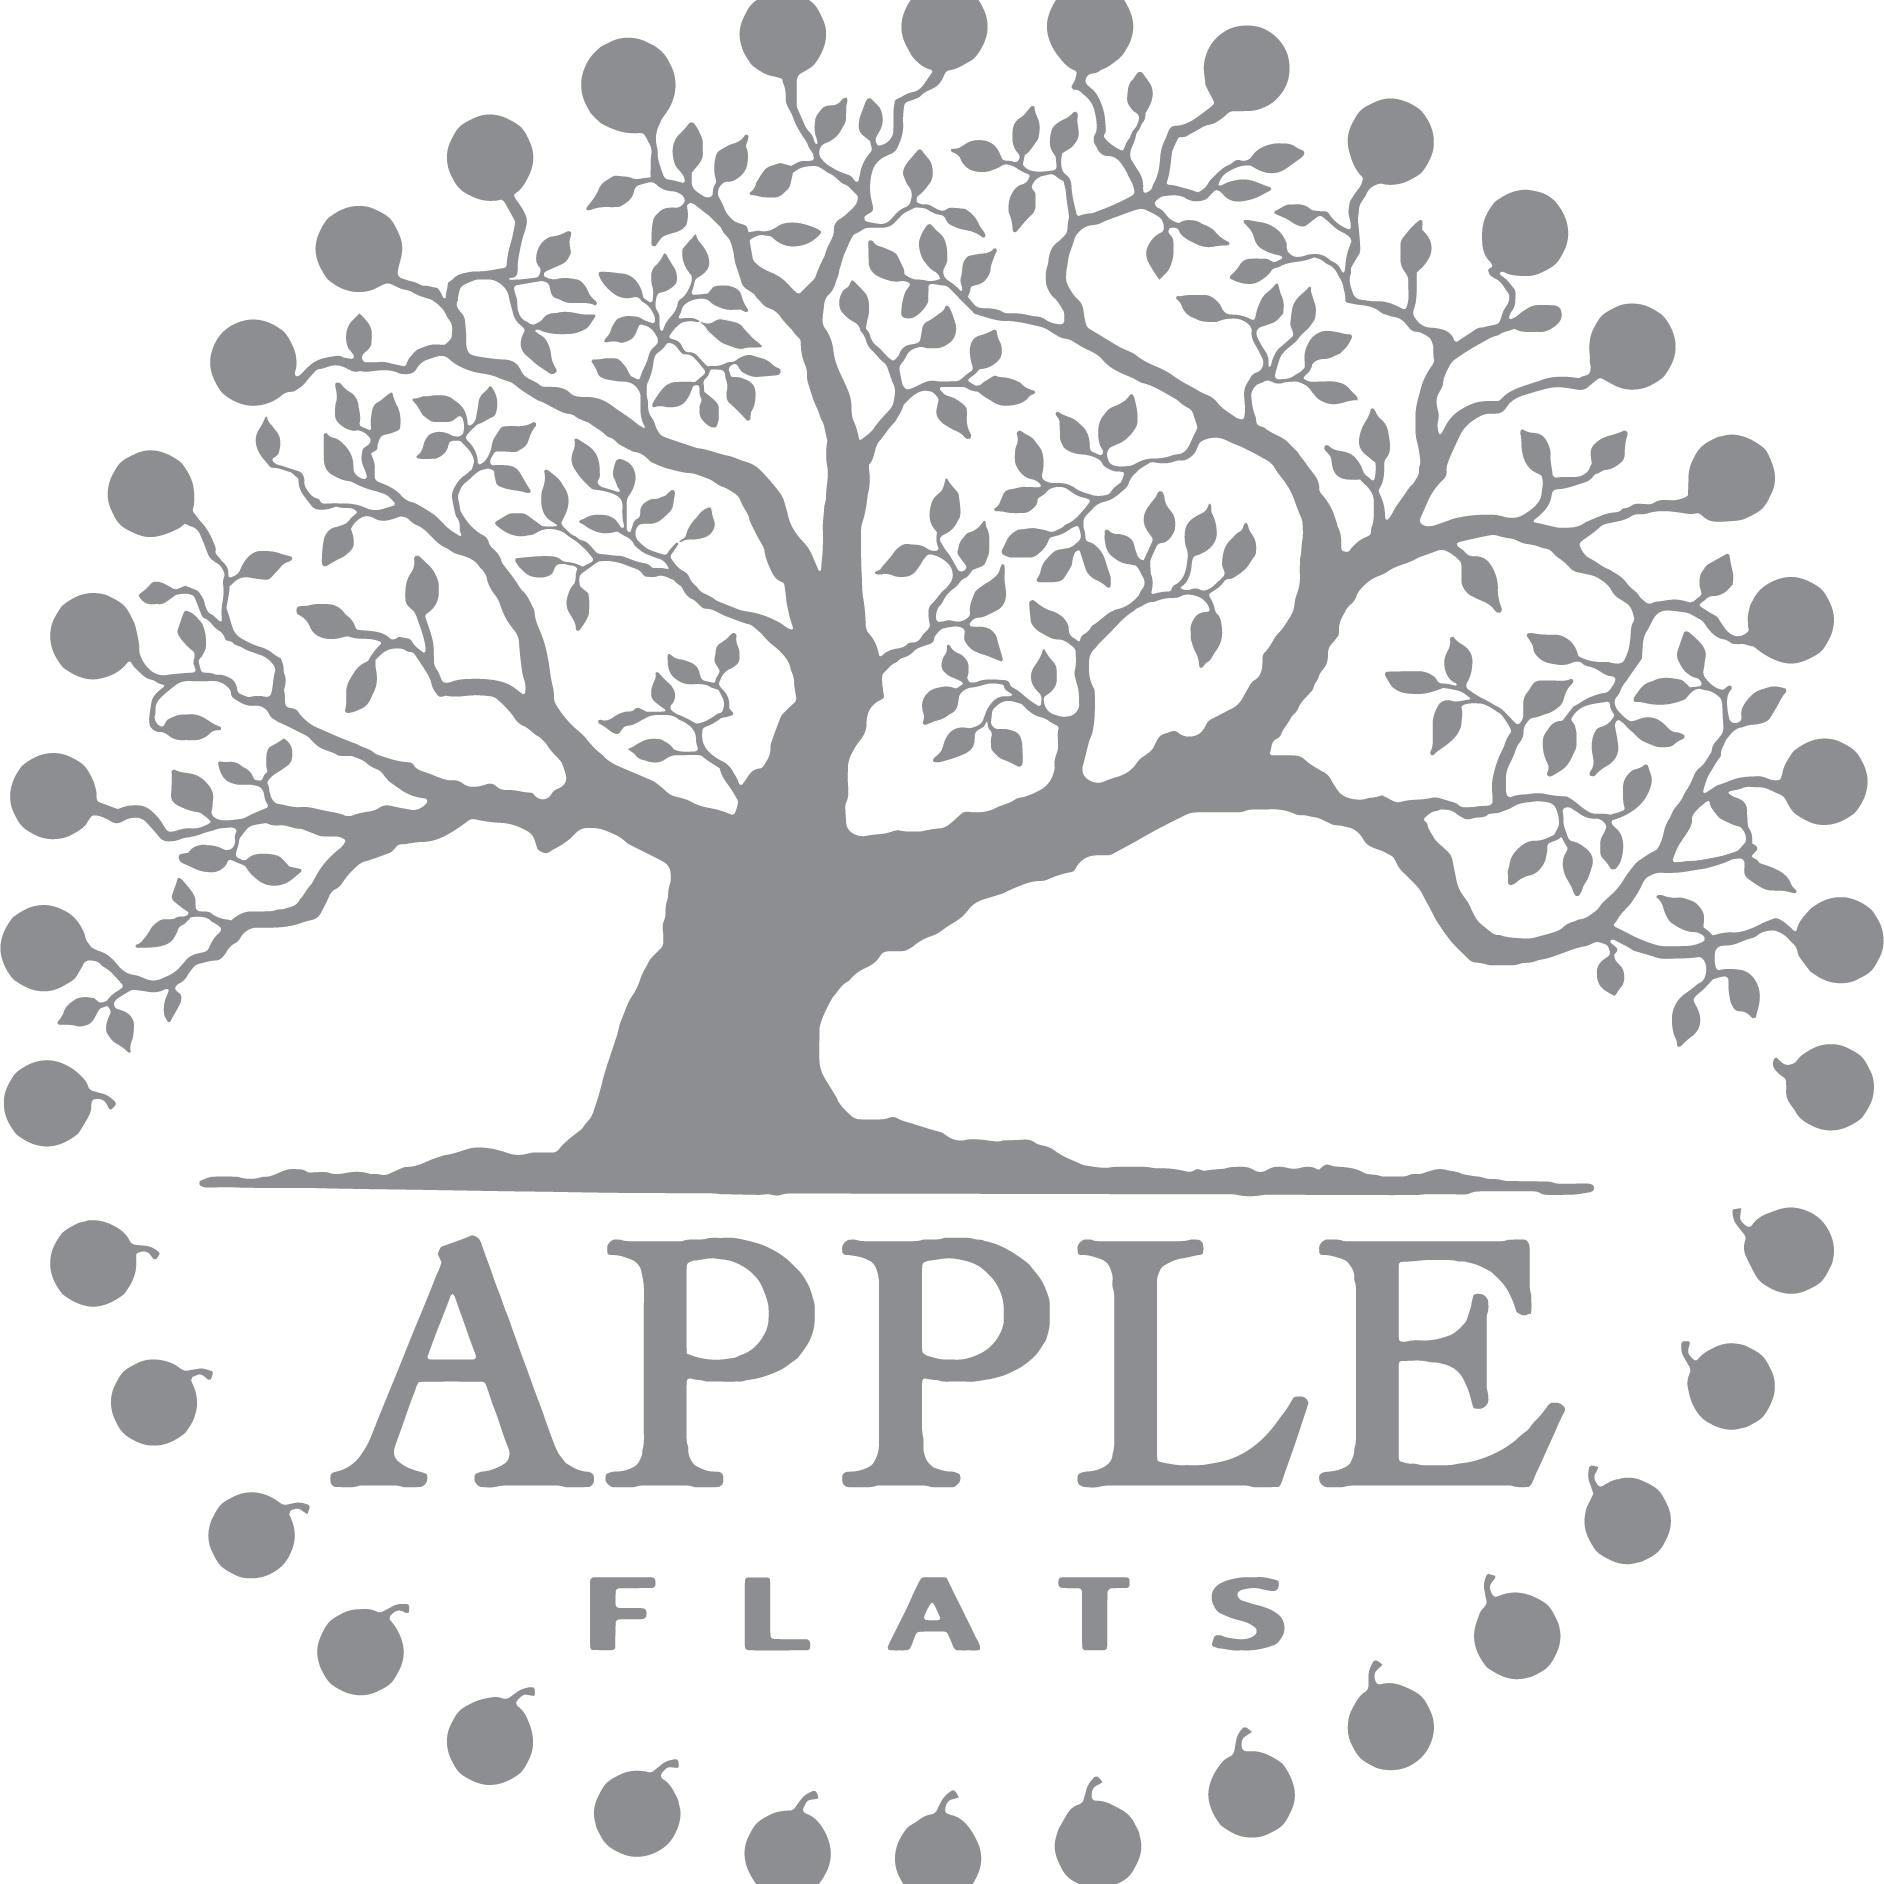 Appleflats